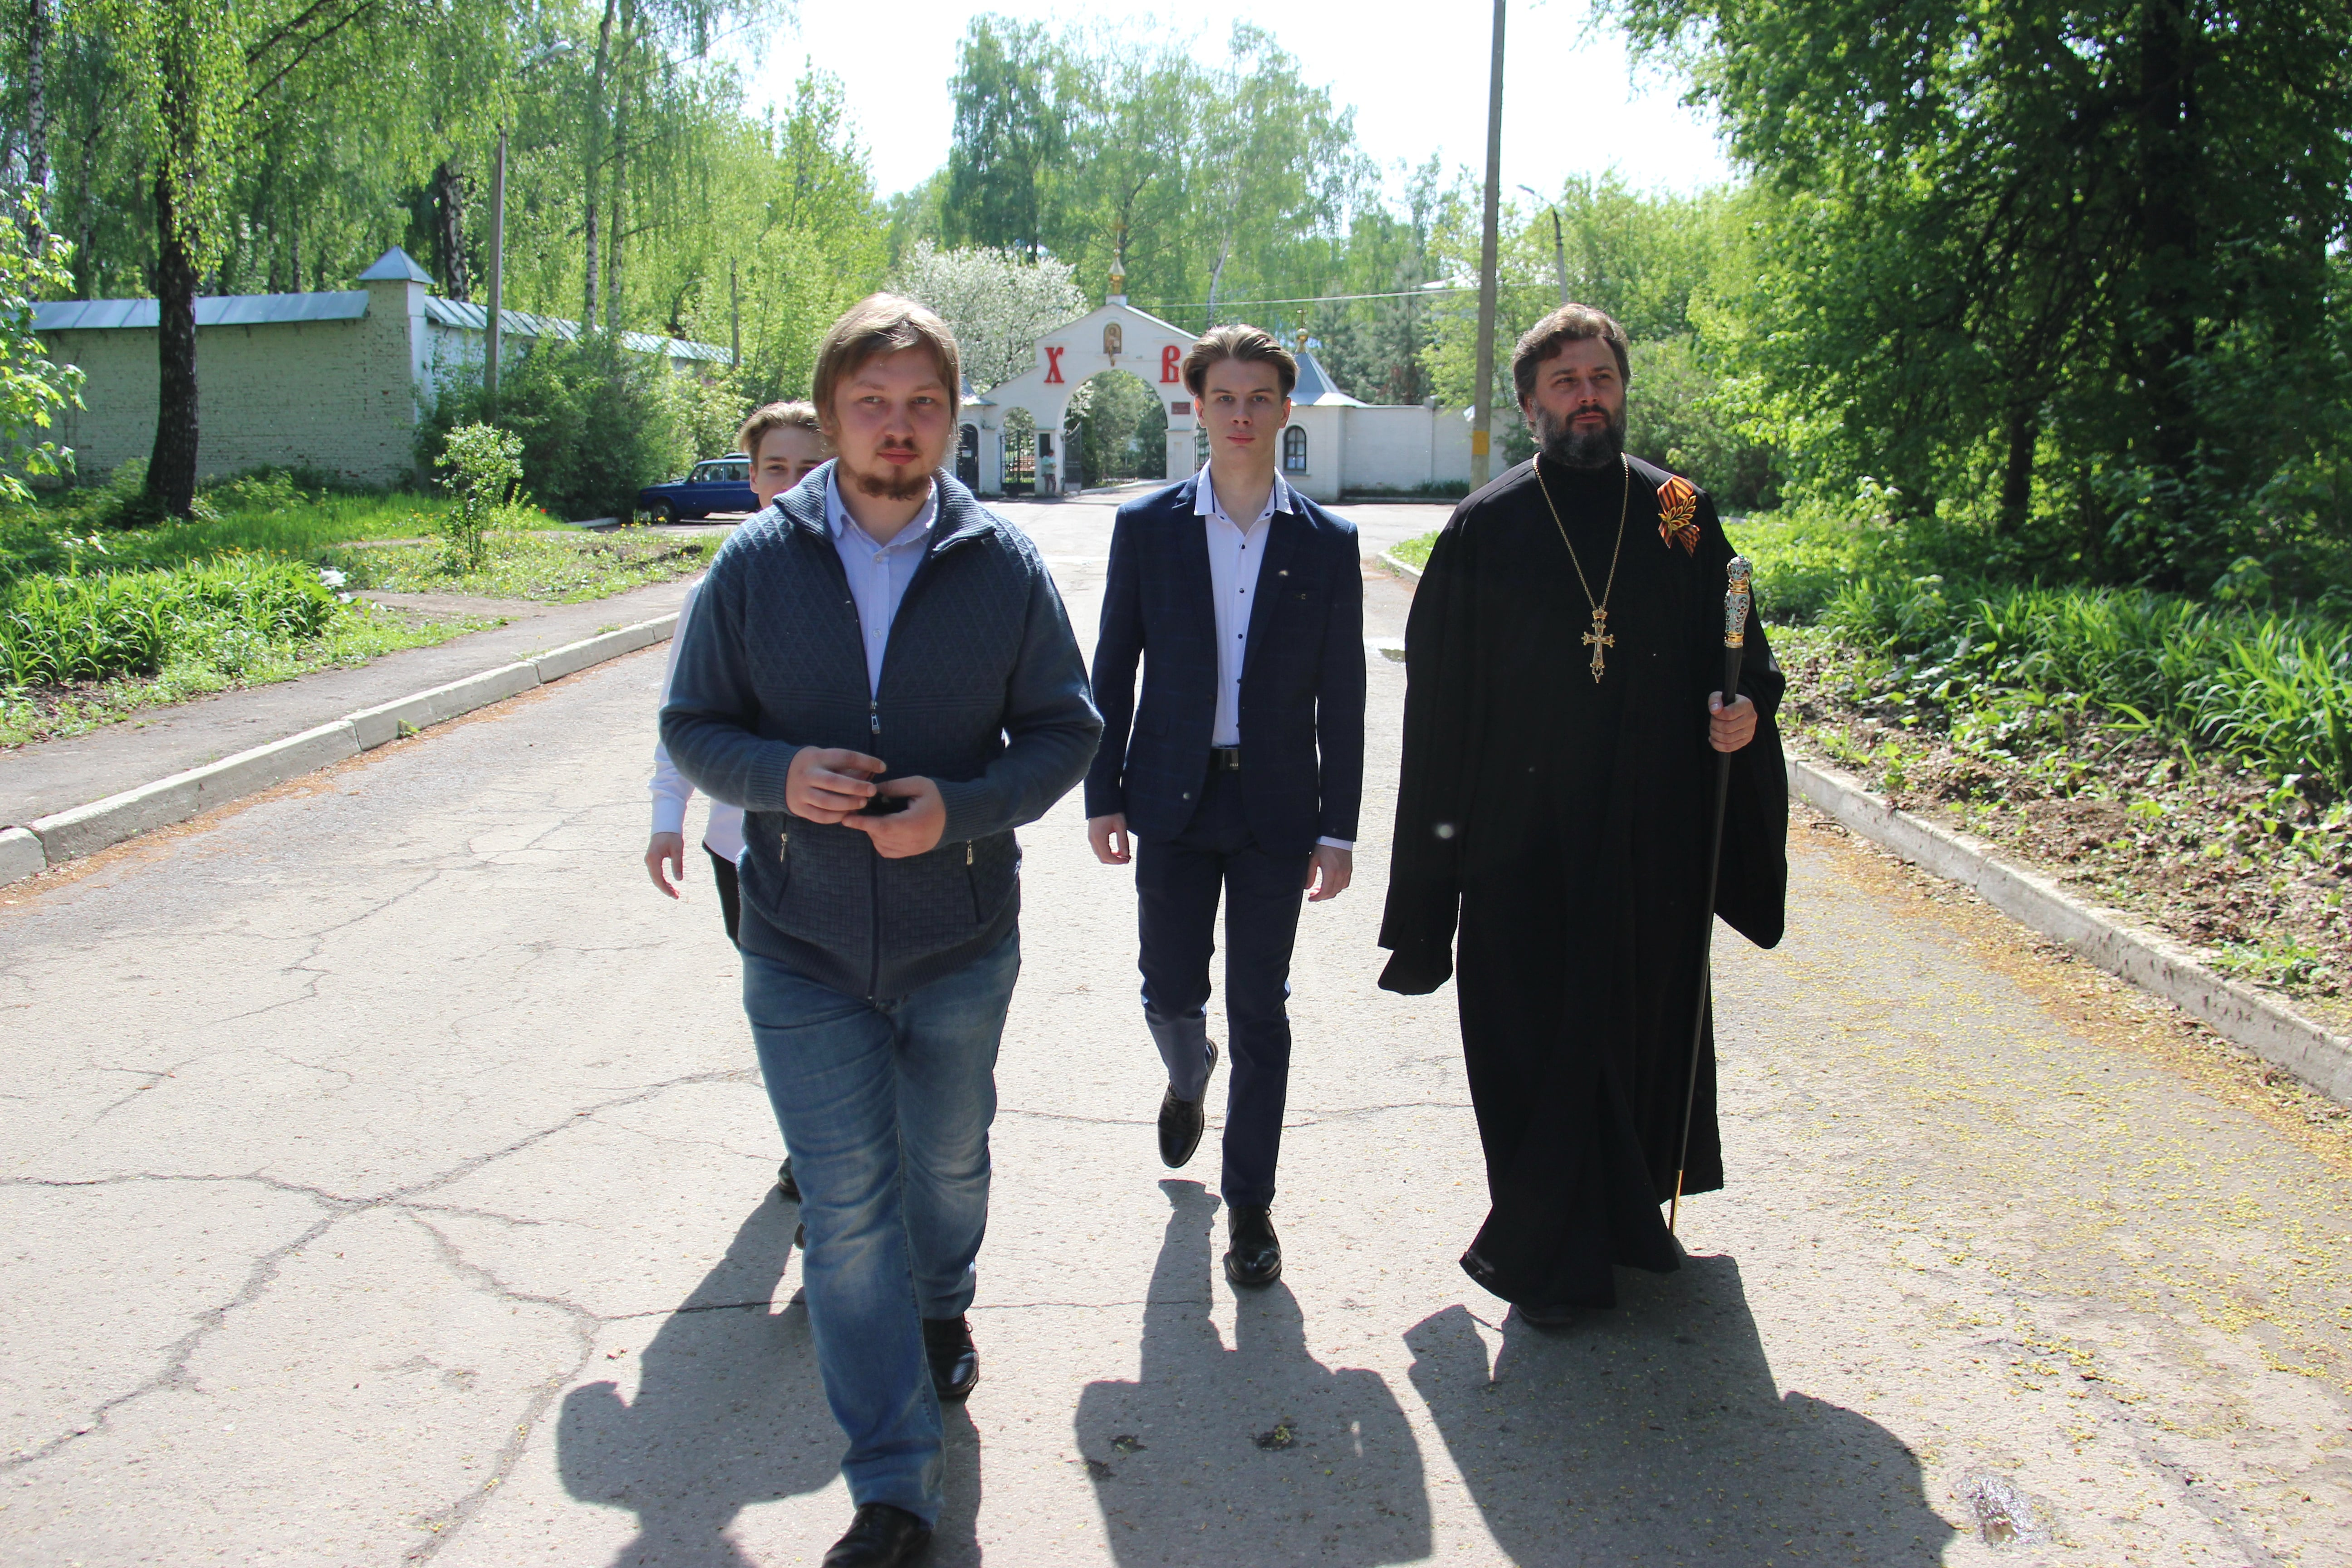 http://monuspen.ru/photoreports/ba2010941251efe9afabca220cb49d76.JPG